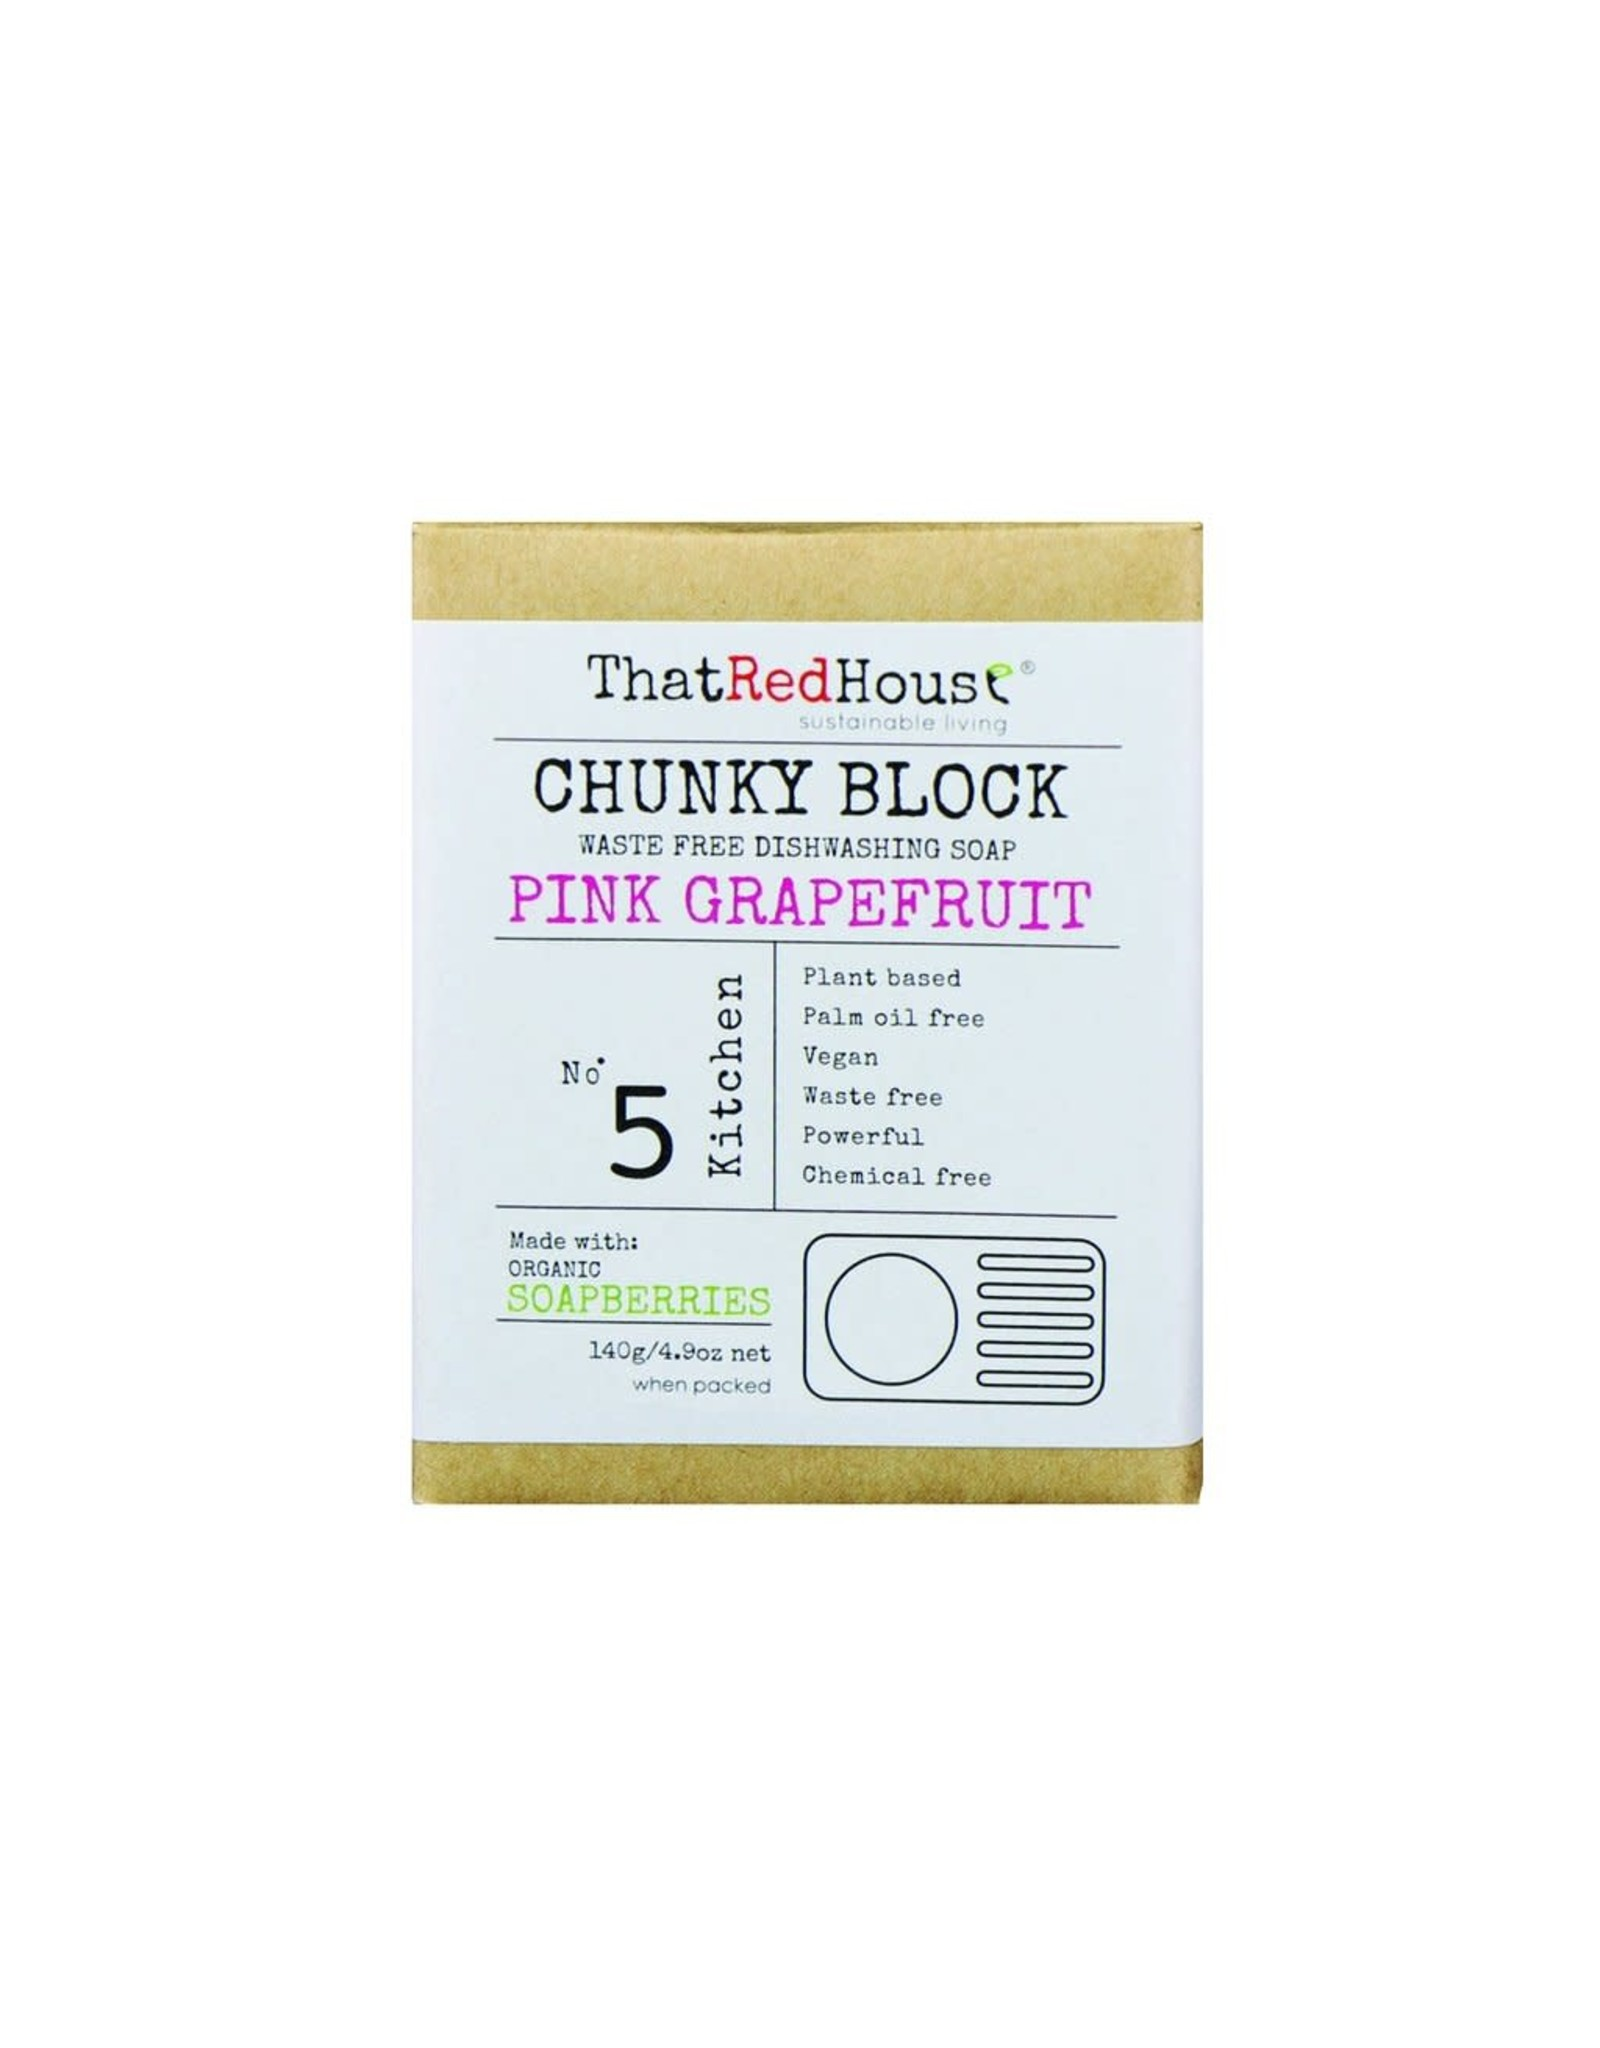 That Red House Chunky Block Dishwashing Soap Pink Grapefruit - 140g